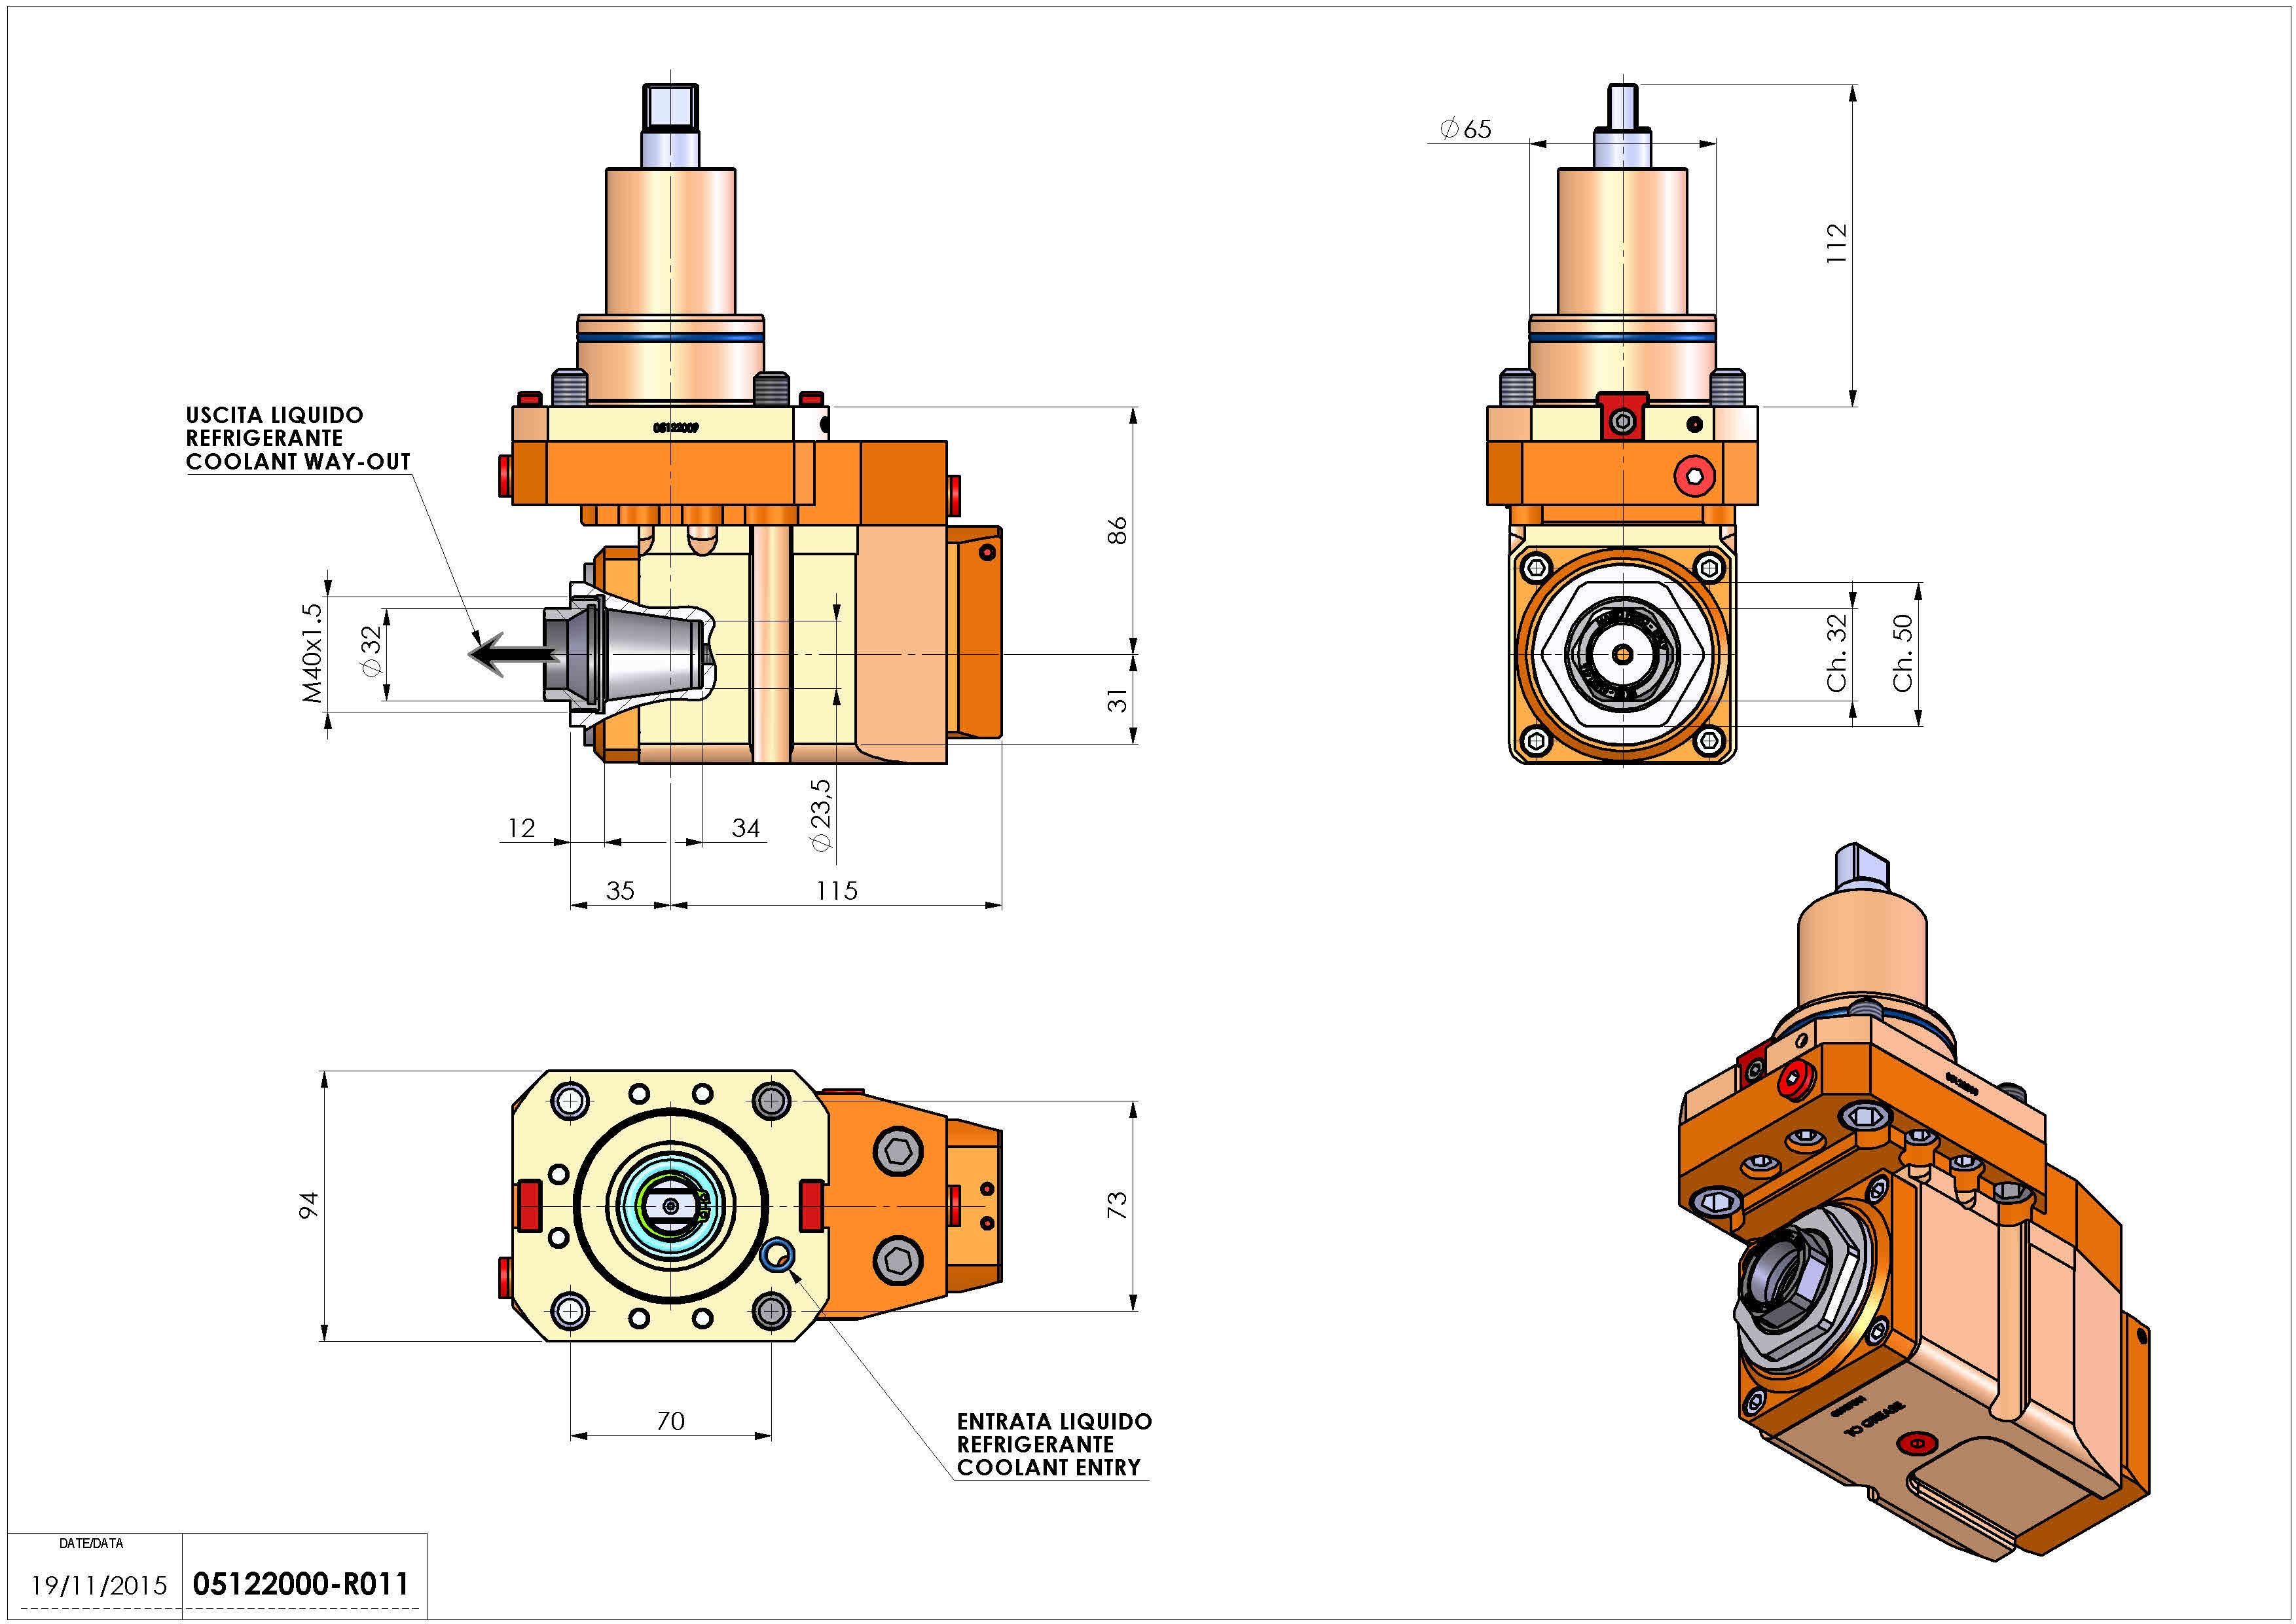 Technical image - LT-A BMT65 ER32F RF OFS H86 DW.